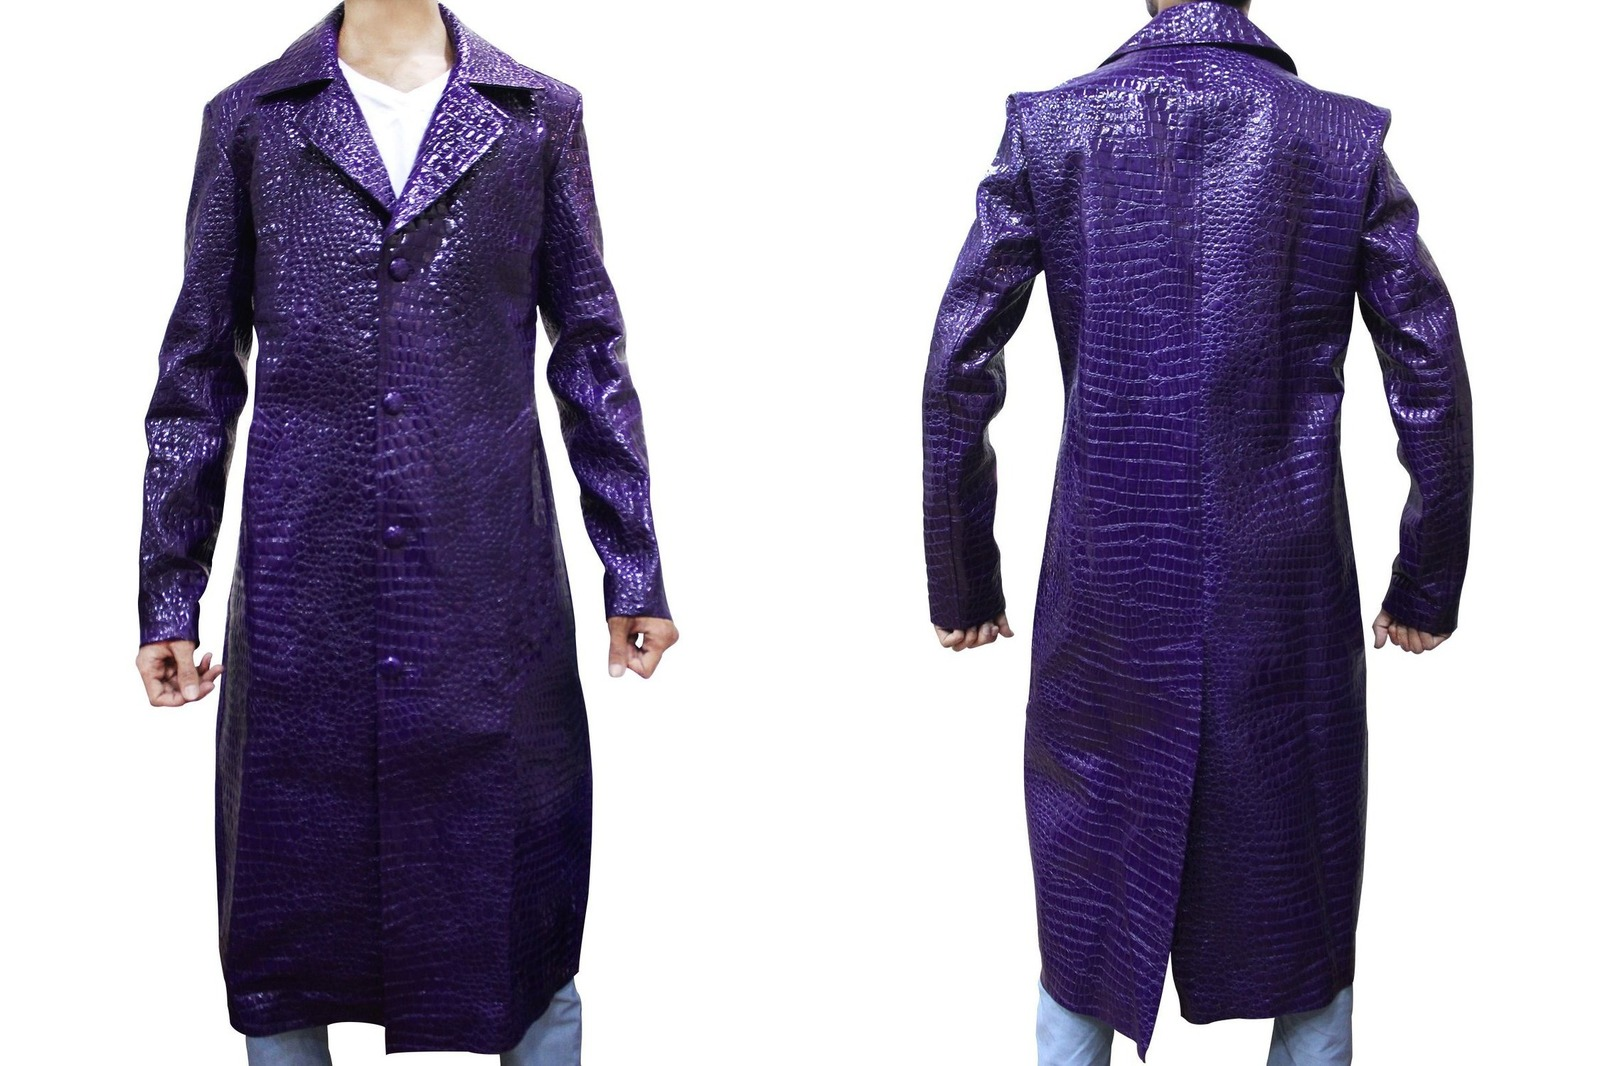 Dewuchi Suicide Squad Jared Leto Joker Purple Long Coat For Men ...